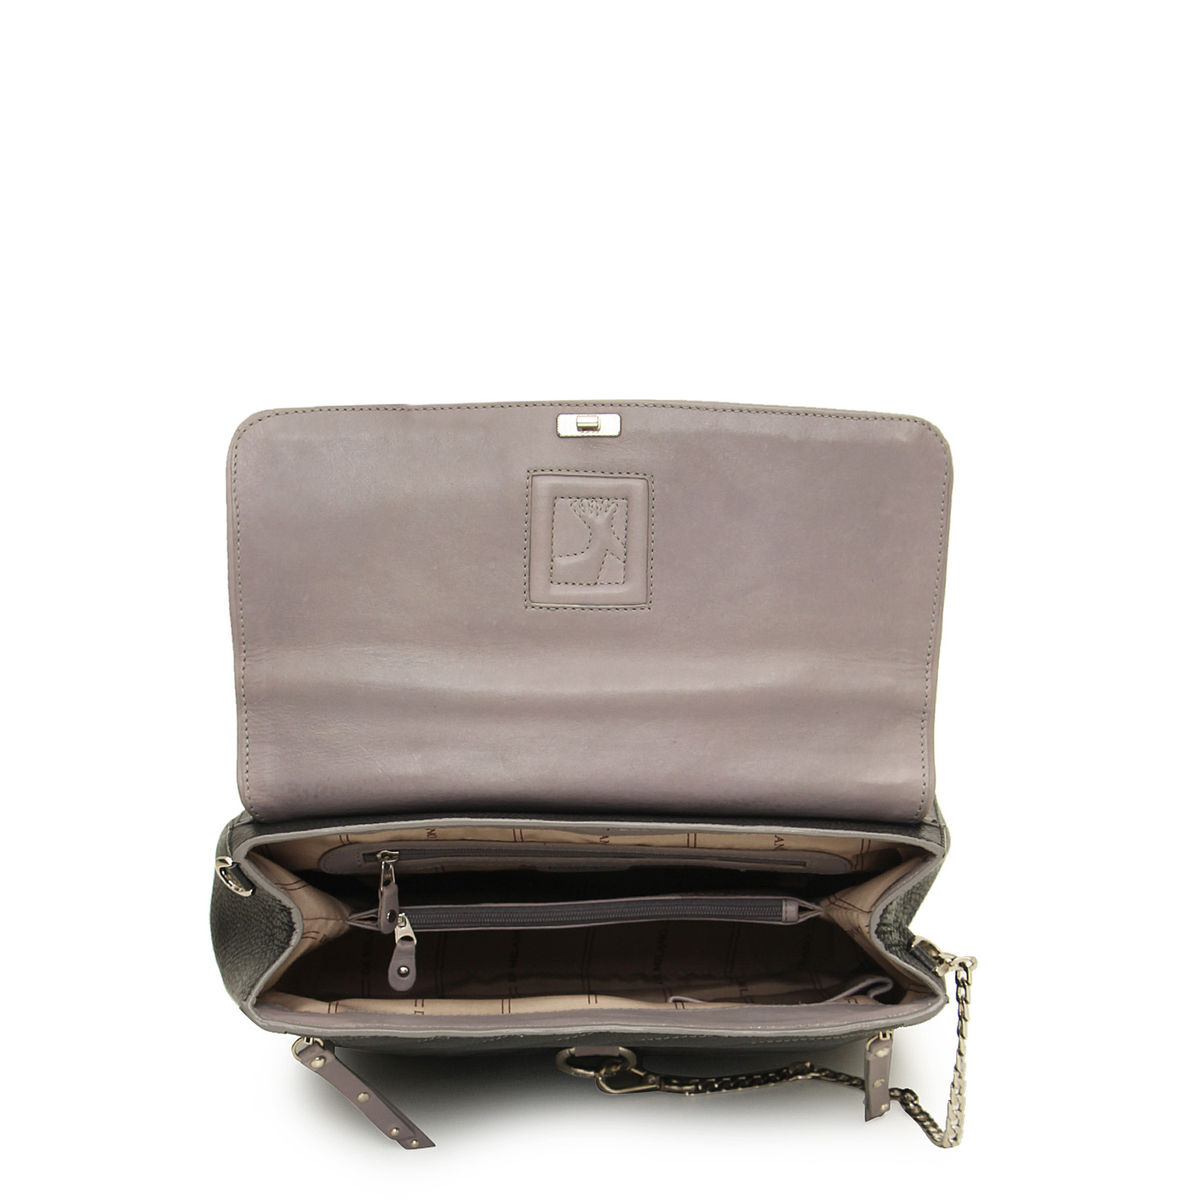 d2cf19bf2e4a zoom Da Milano Black Grey Satchel Bag. 1  2